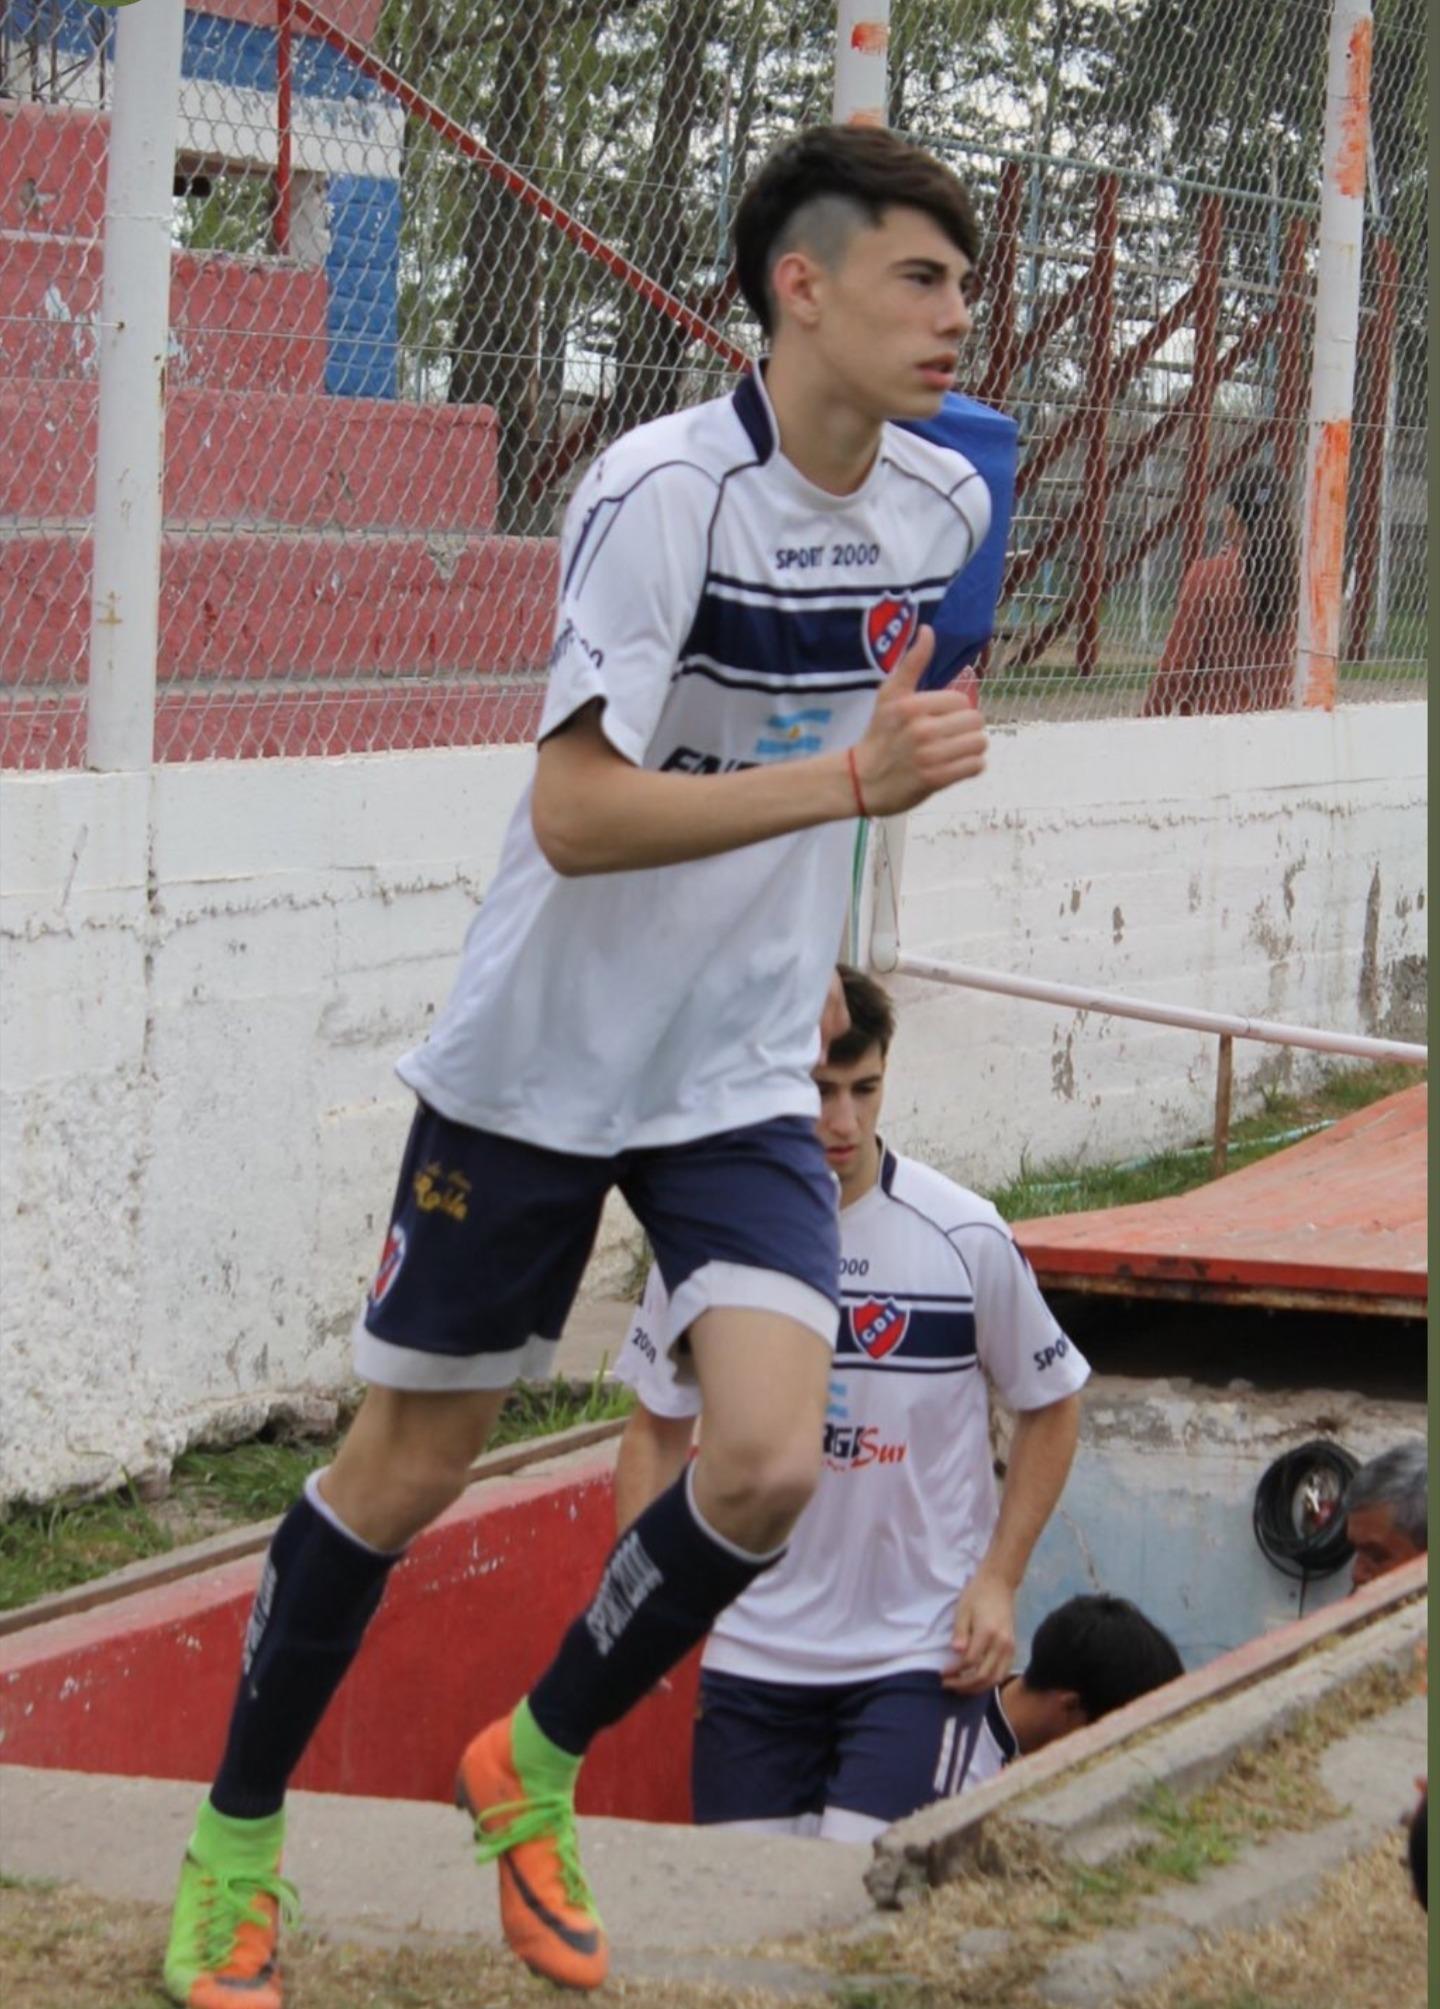 Francisco Centeno